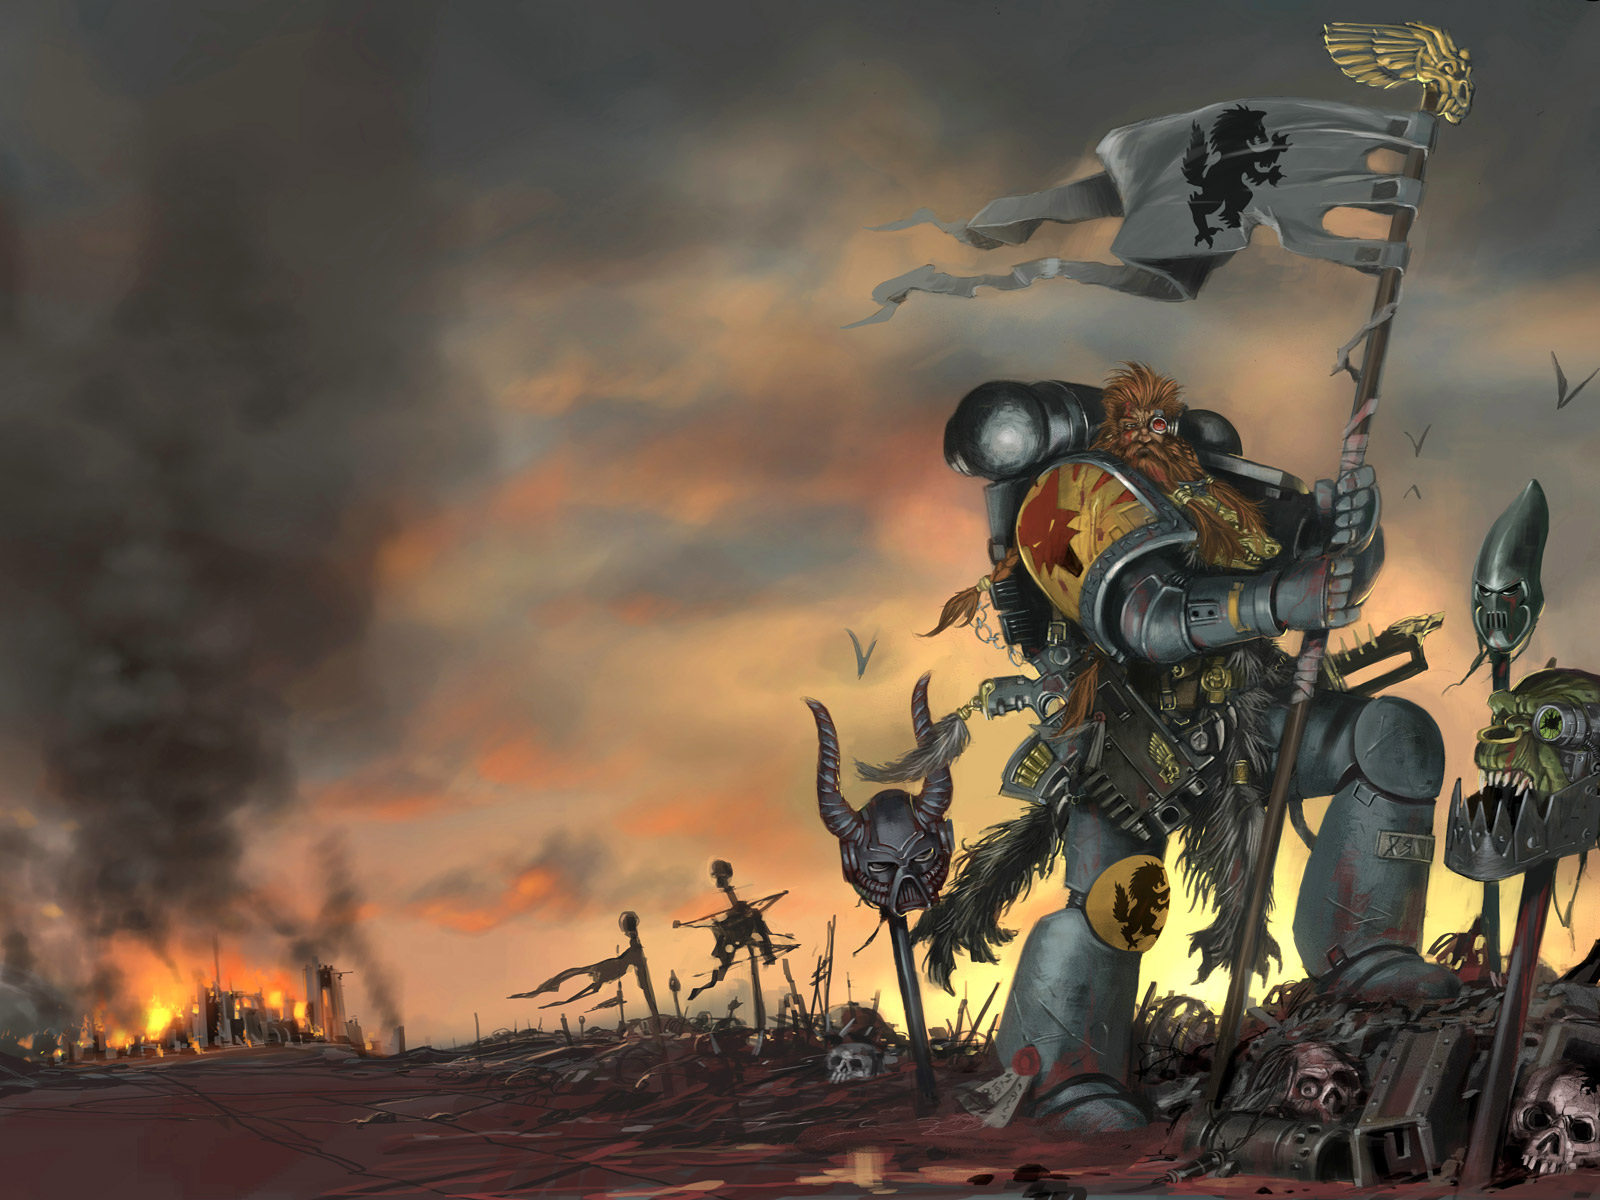 wallpaper warhammer 40k video - photo #31